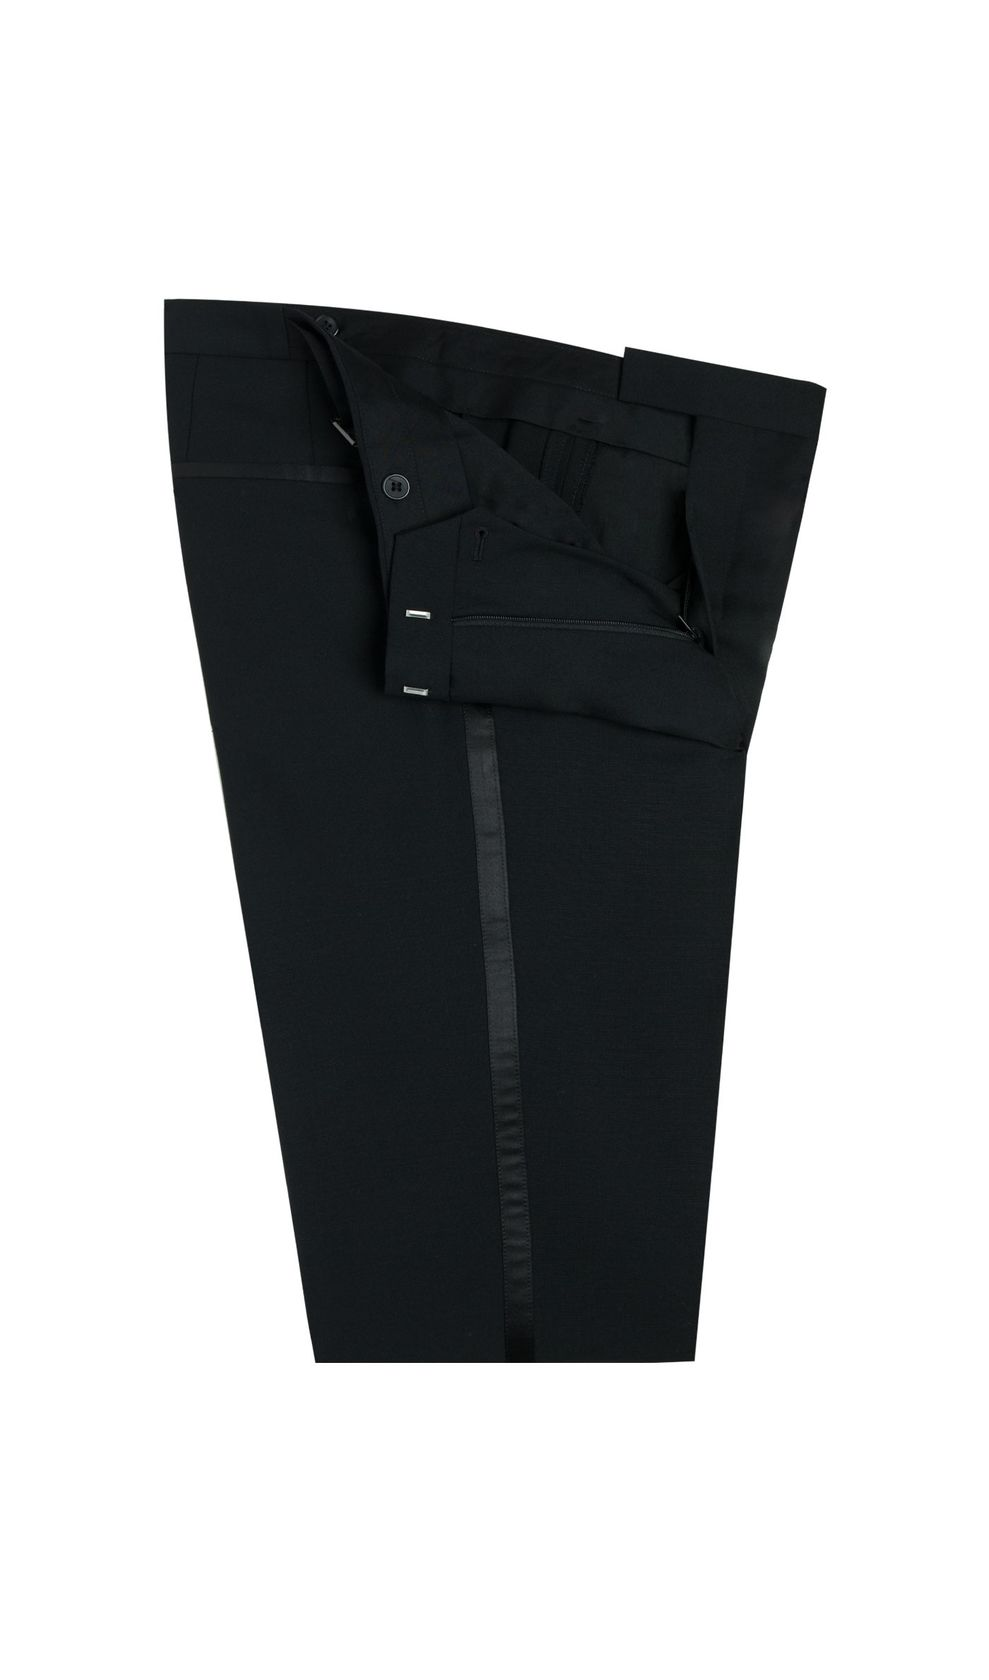 men suit trouser, corporate and wedding suit, tuxedo trouser maker in lagos